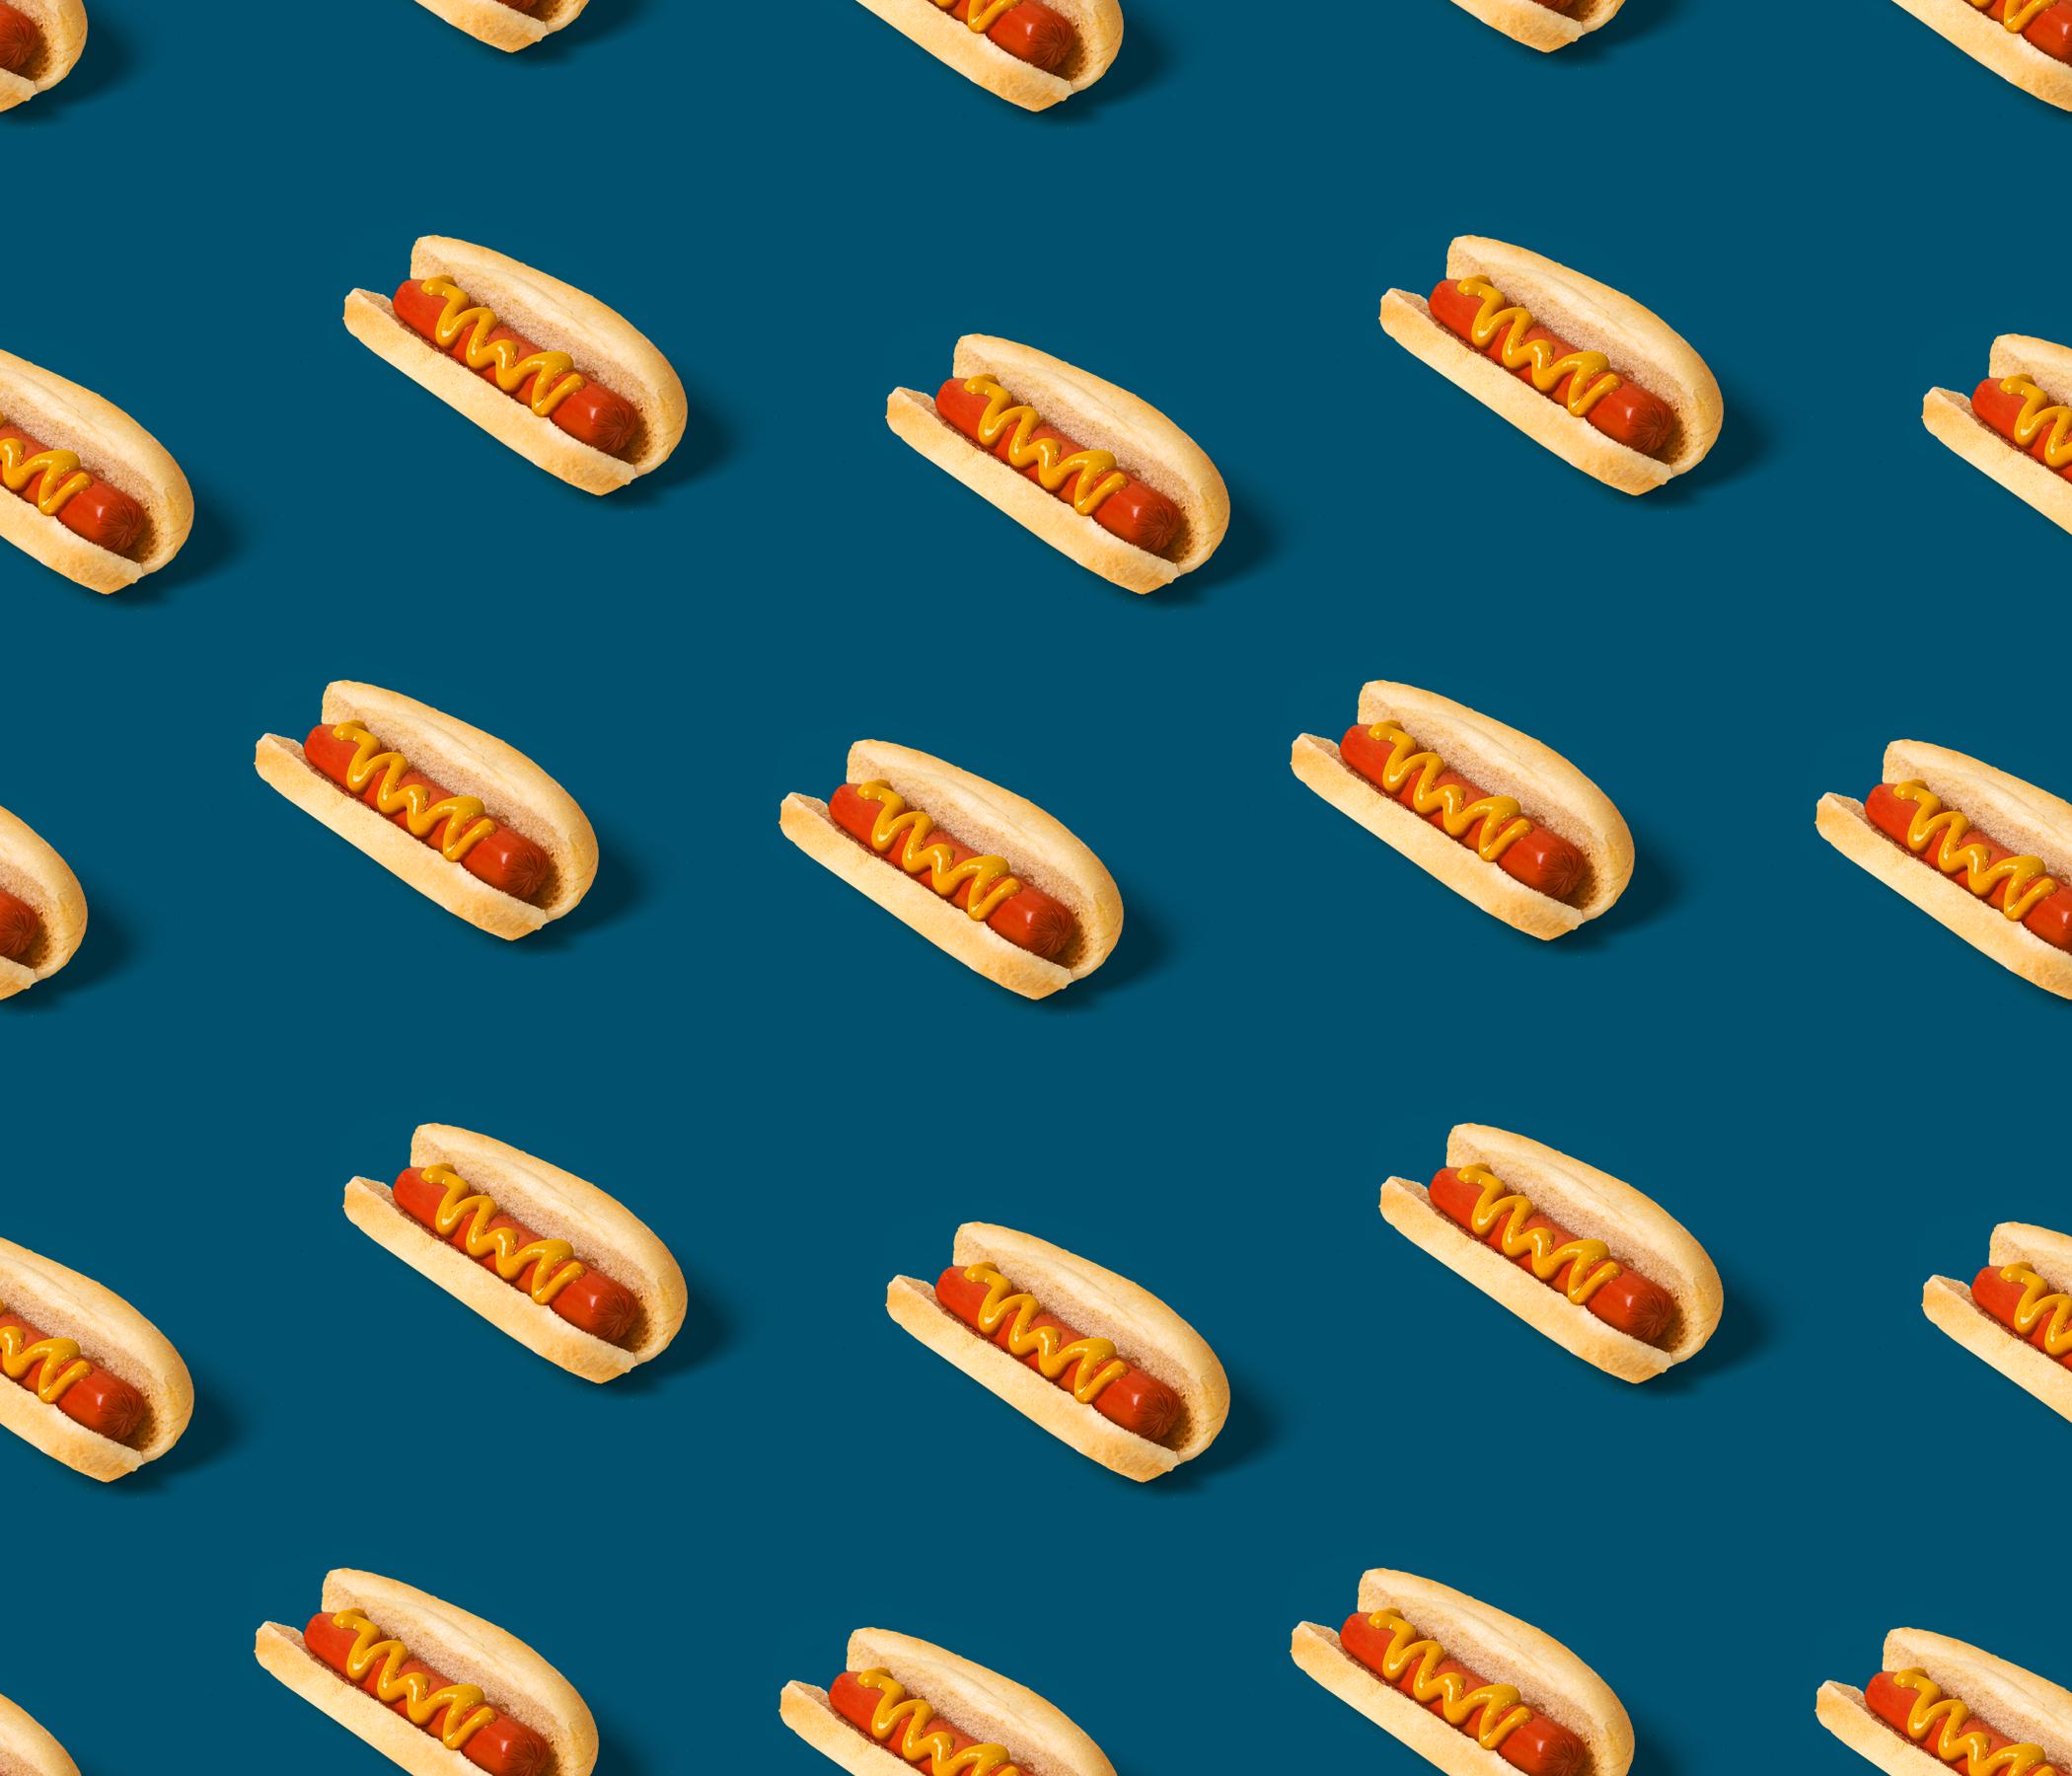 Hotdog blue tileable